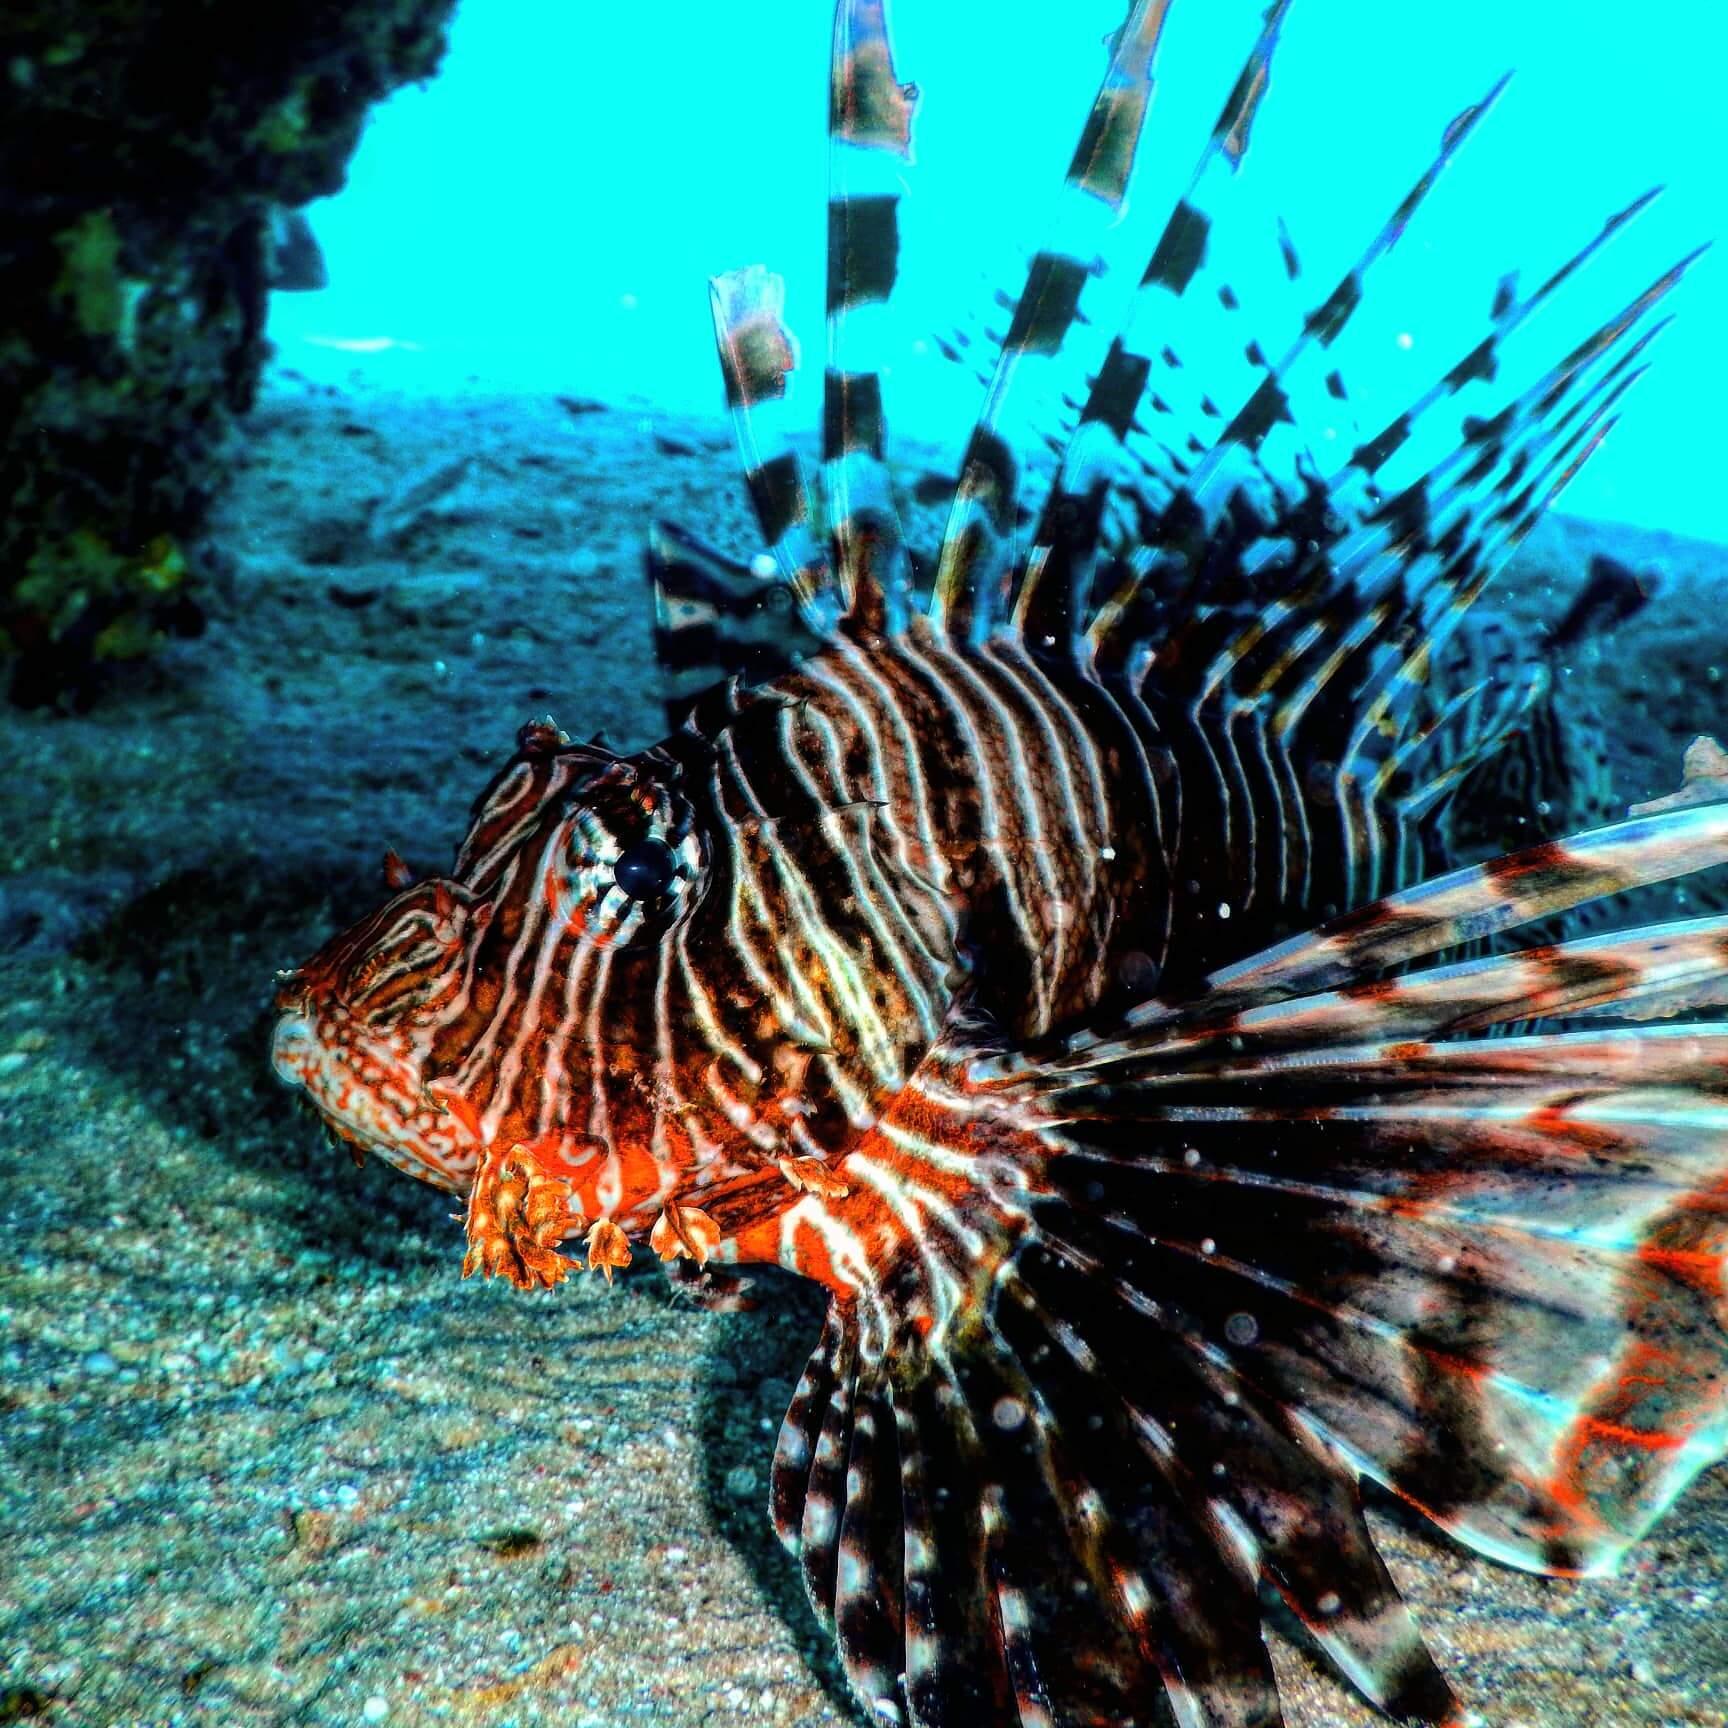 Egypt-REDSEA-Hurghada-DivePro-Academy-Scuba-Diving-Center-Lion-Fish